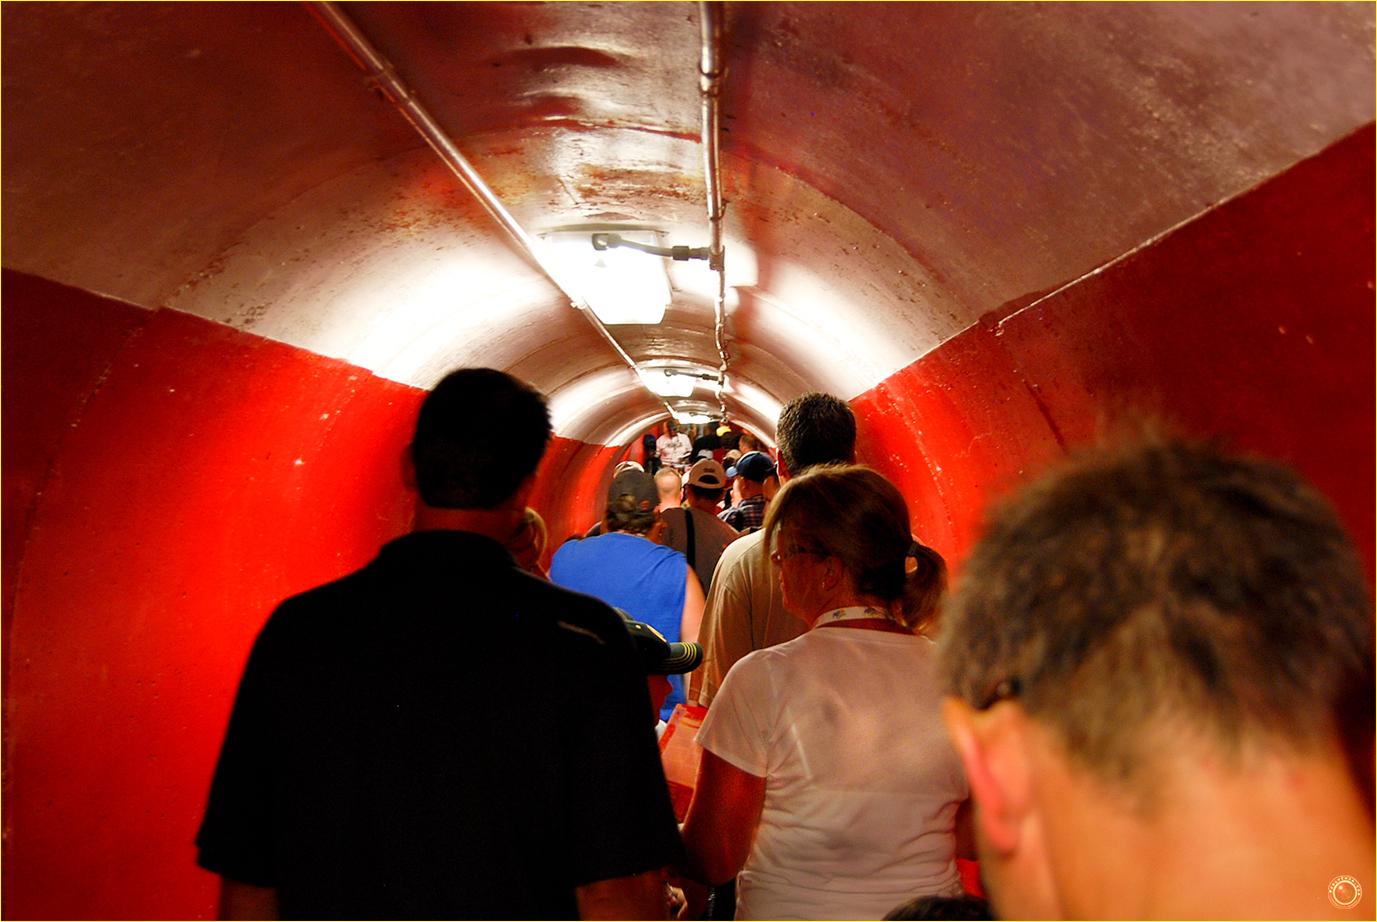 21 Nascar Tunnel Vision